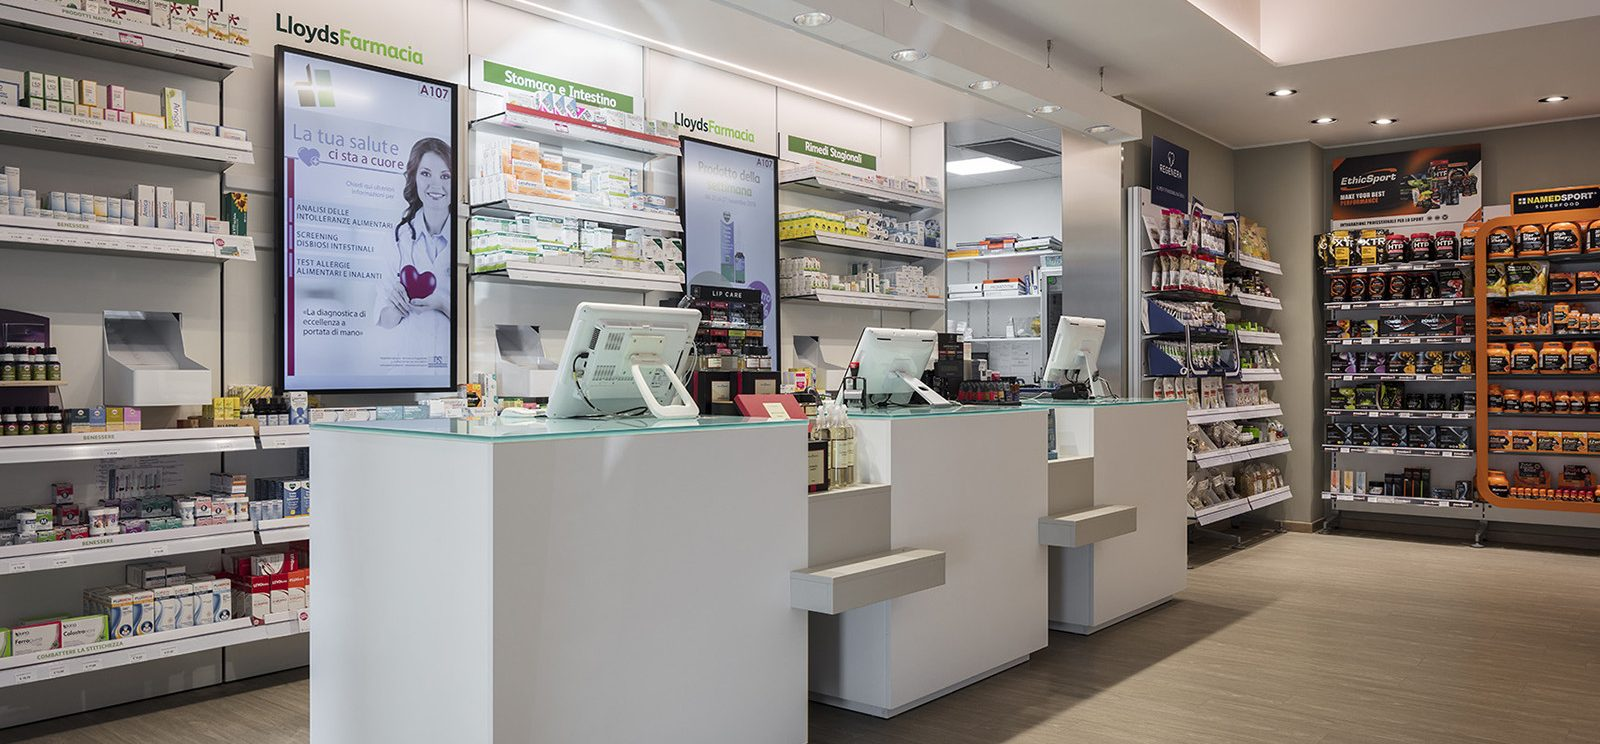 Farmacia San Martino dott. Genesi, Forlì - bancone